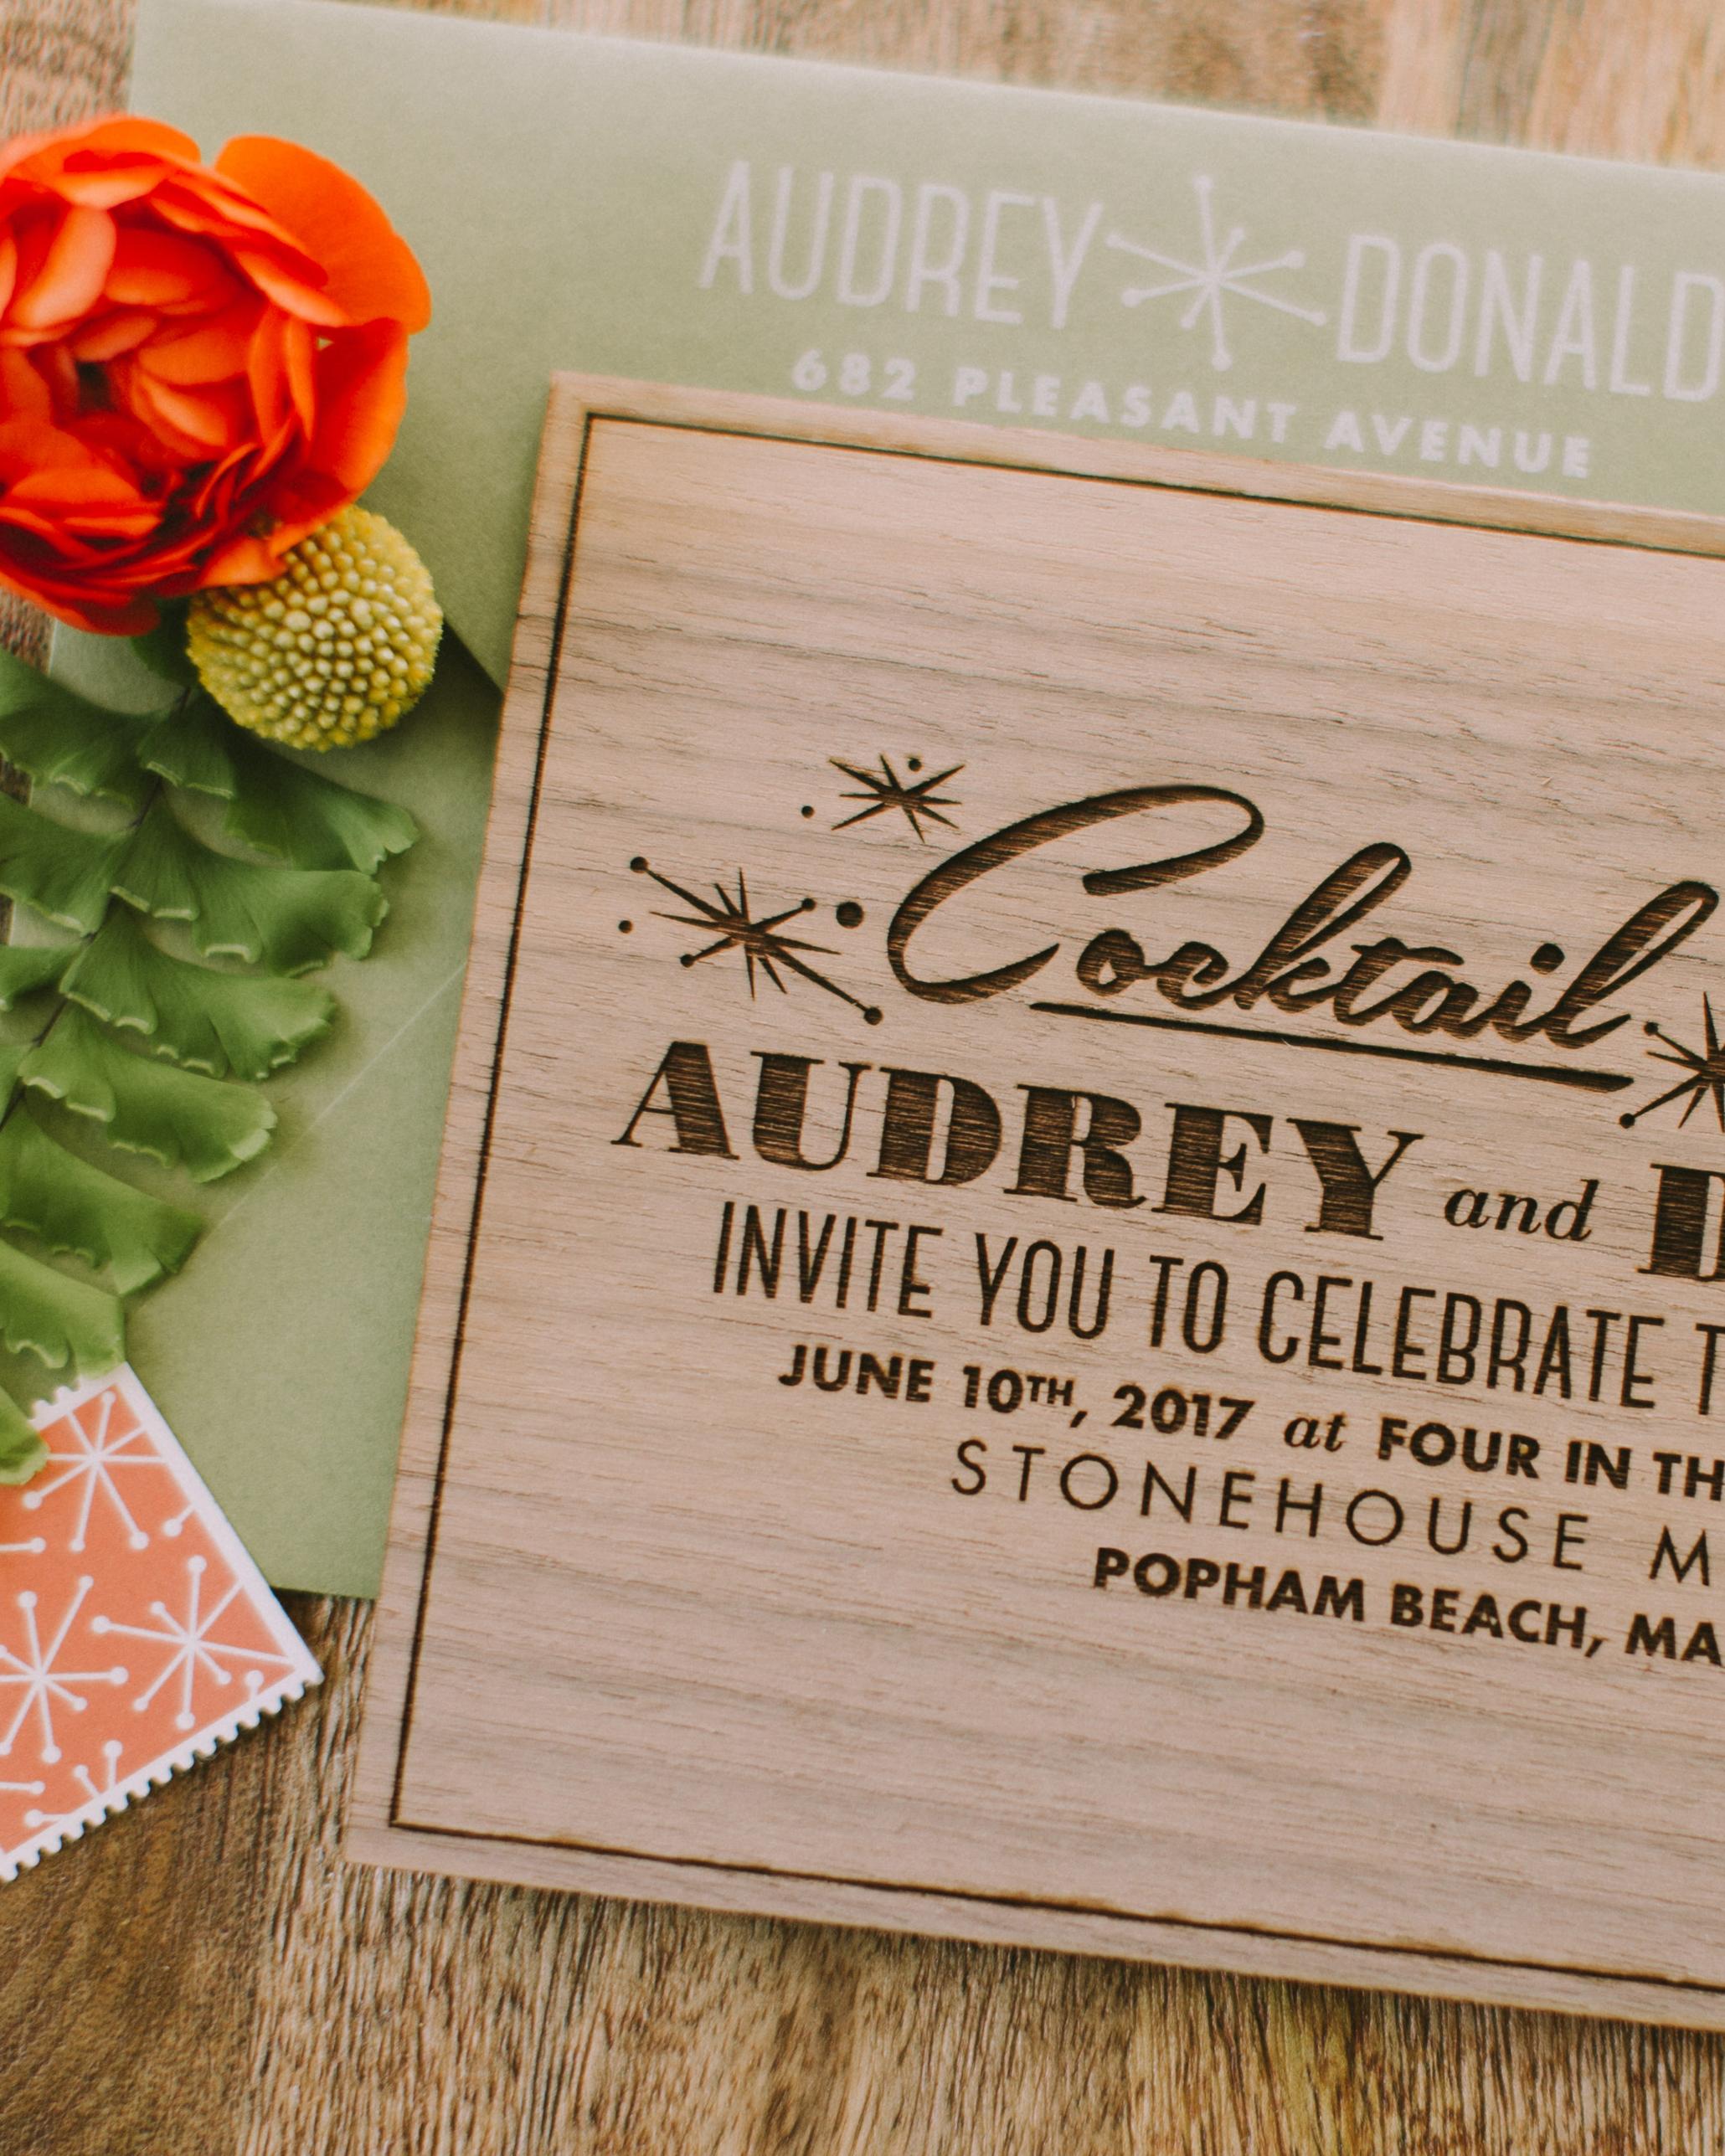 mid-century modern wedding invitation design, custom designed Las Vegas Palm Springs retro wedding invitation suite, luxury one of a kind original wedding invitation, fun and modern